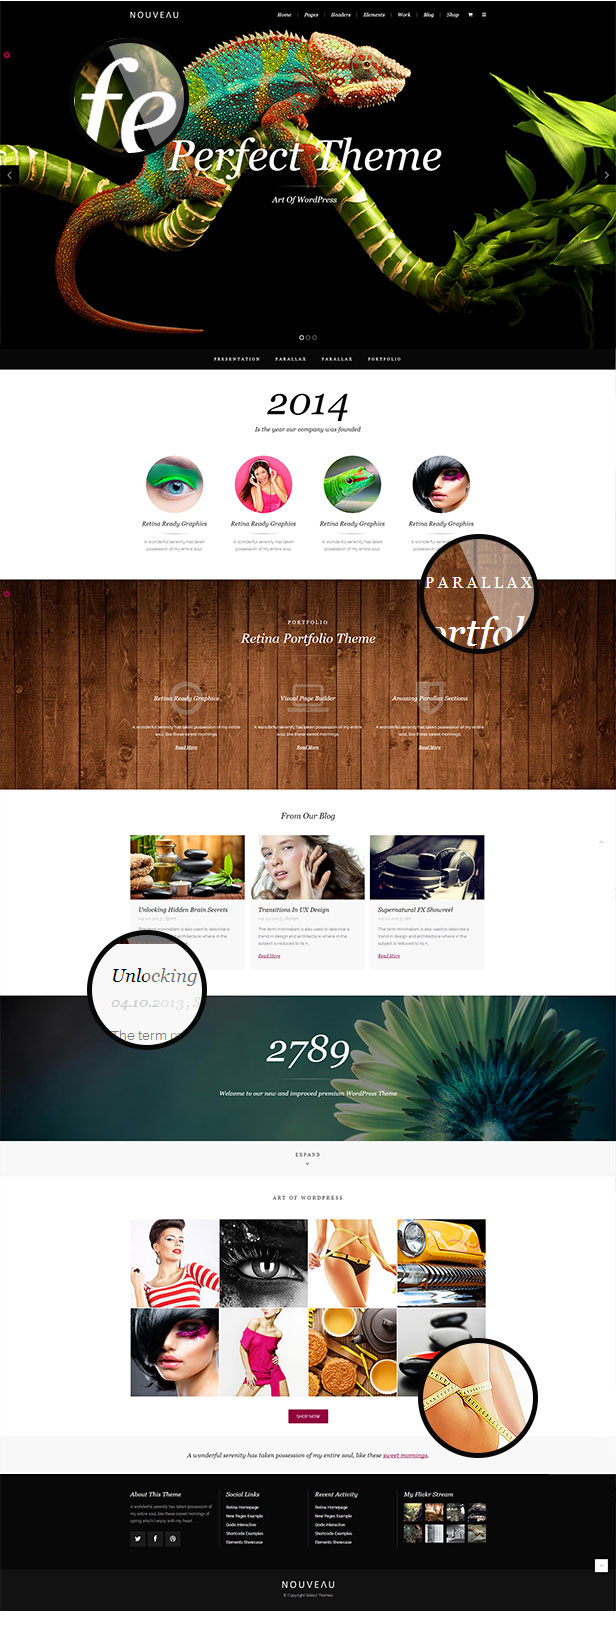 Nouveau - Multi-Purpose Retina WordPress Theme - 3